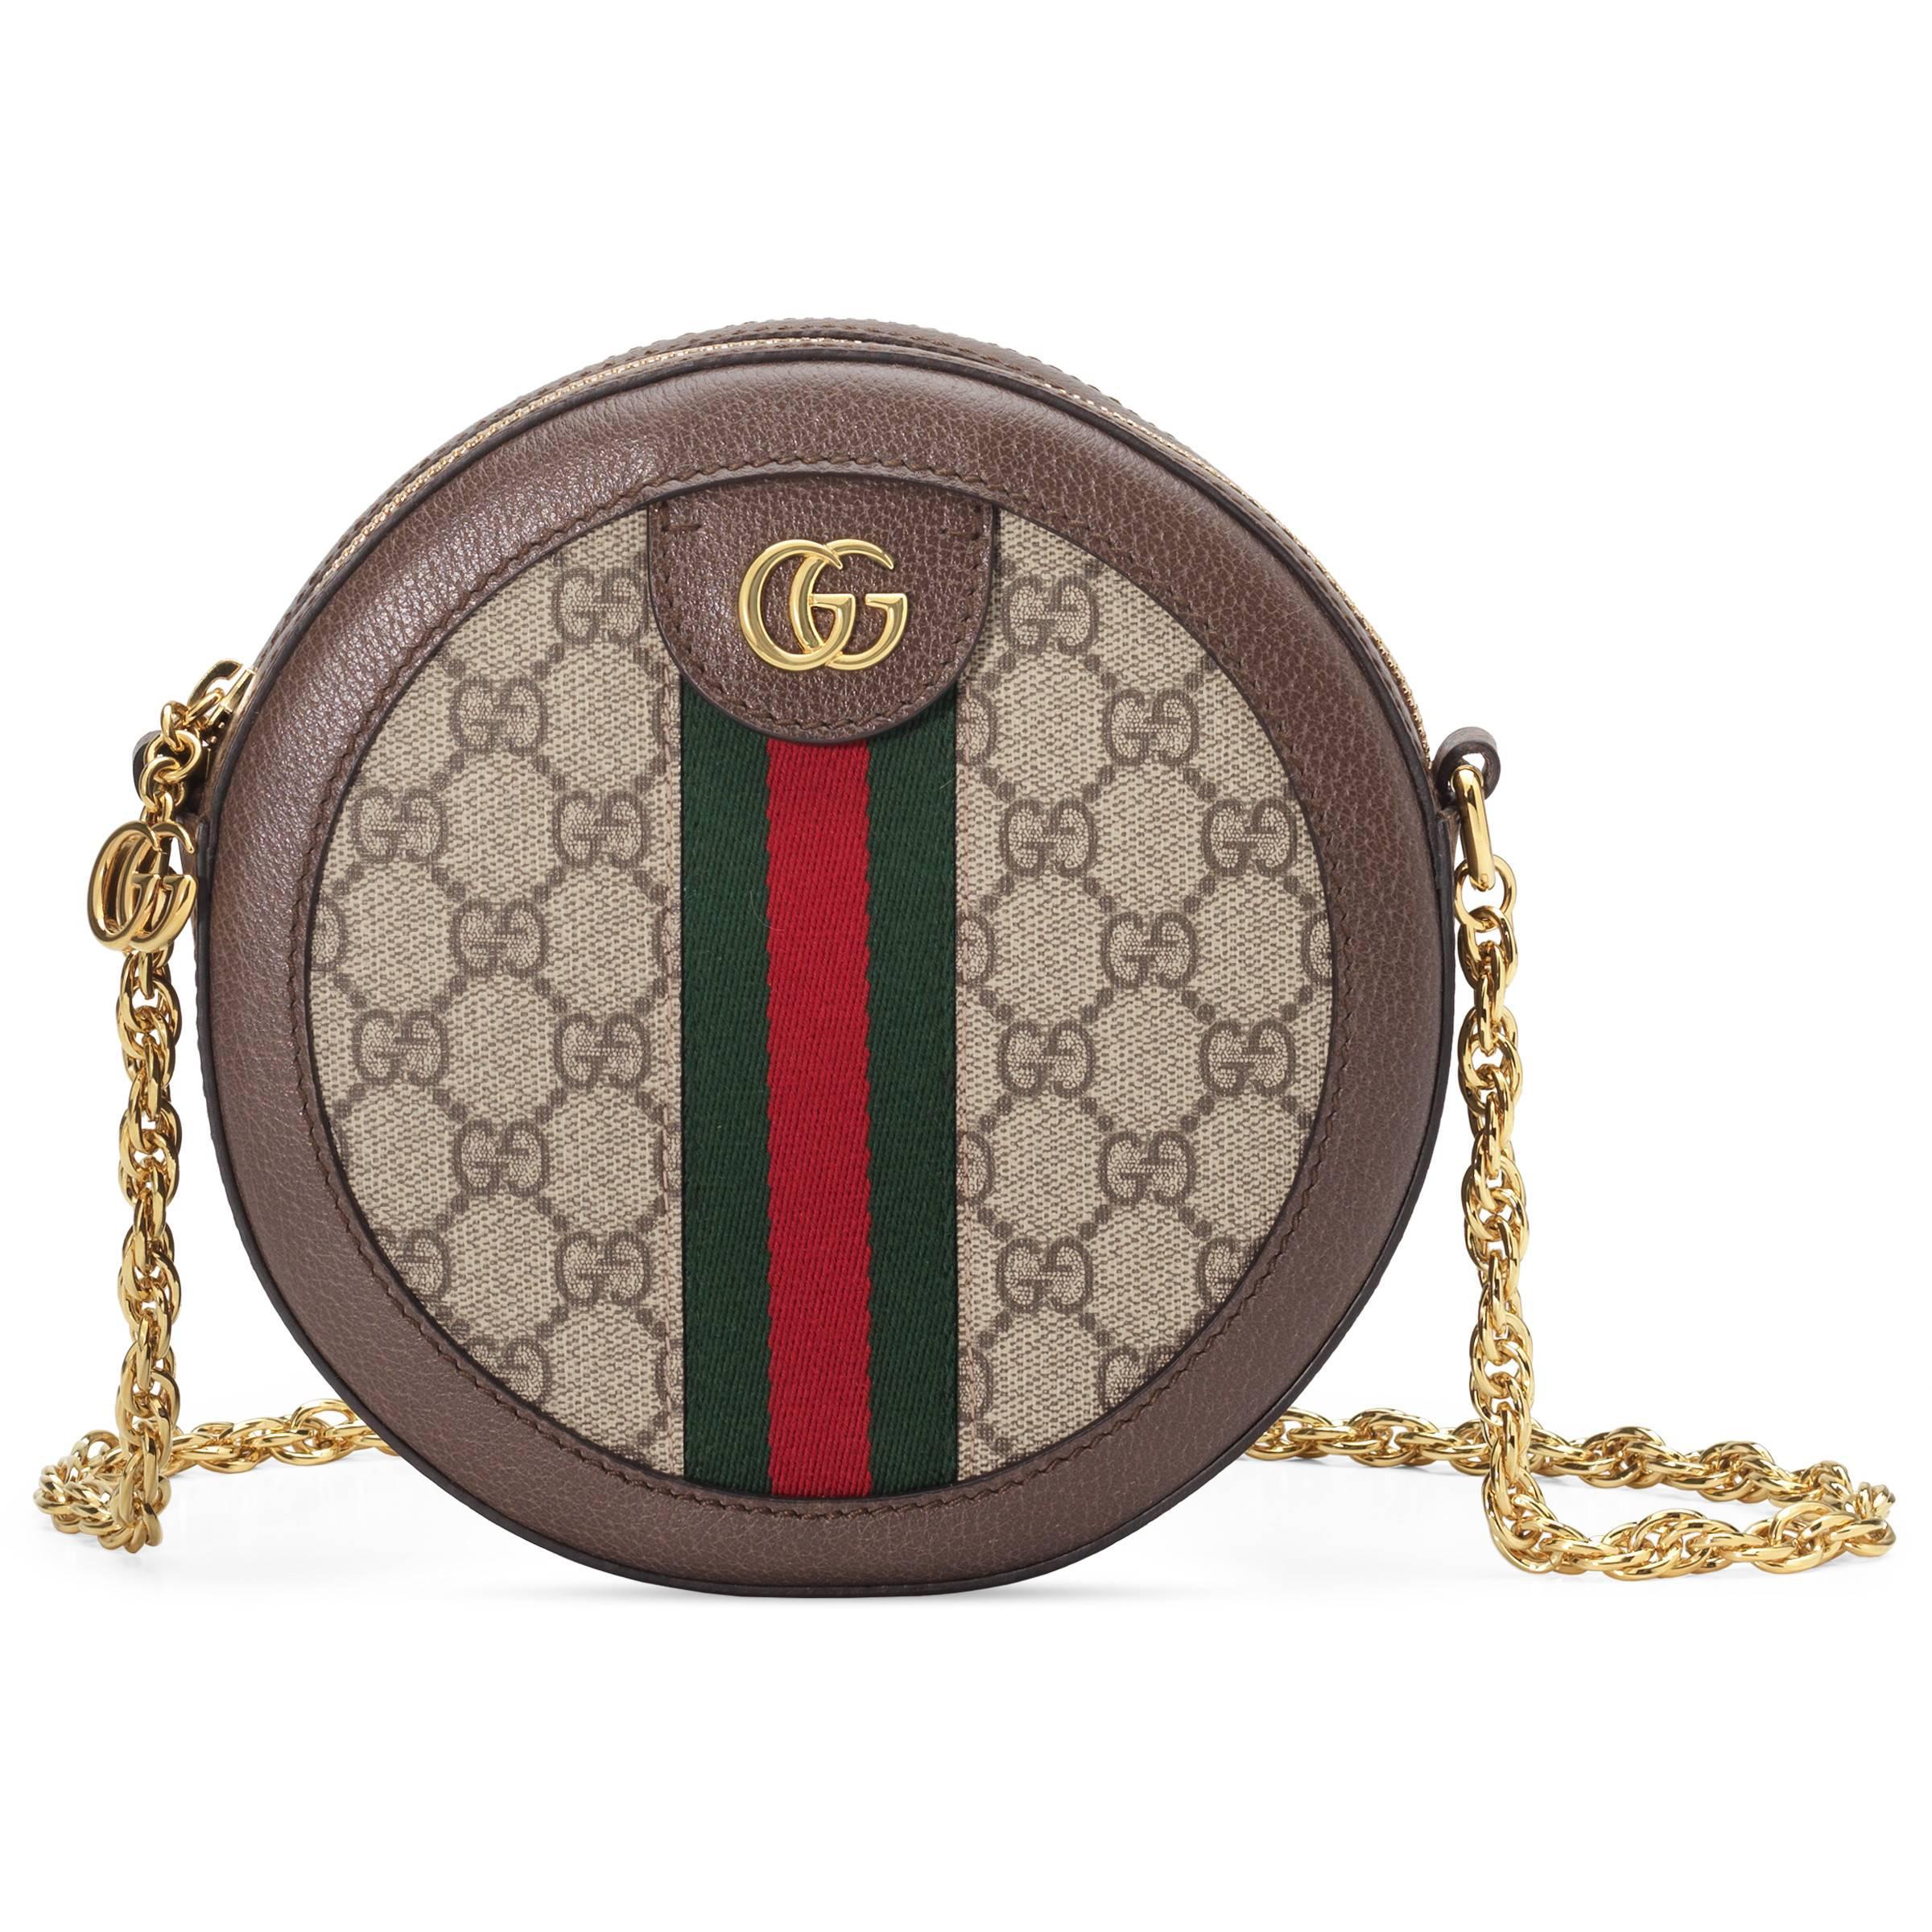 56de906b3b4182 Gucci - Natural Ophidia Mini GG Round Shoulder Bag - Lyst. View fullscreen